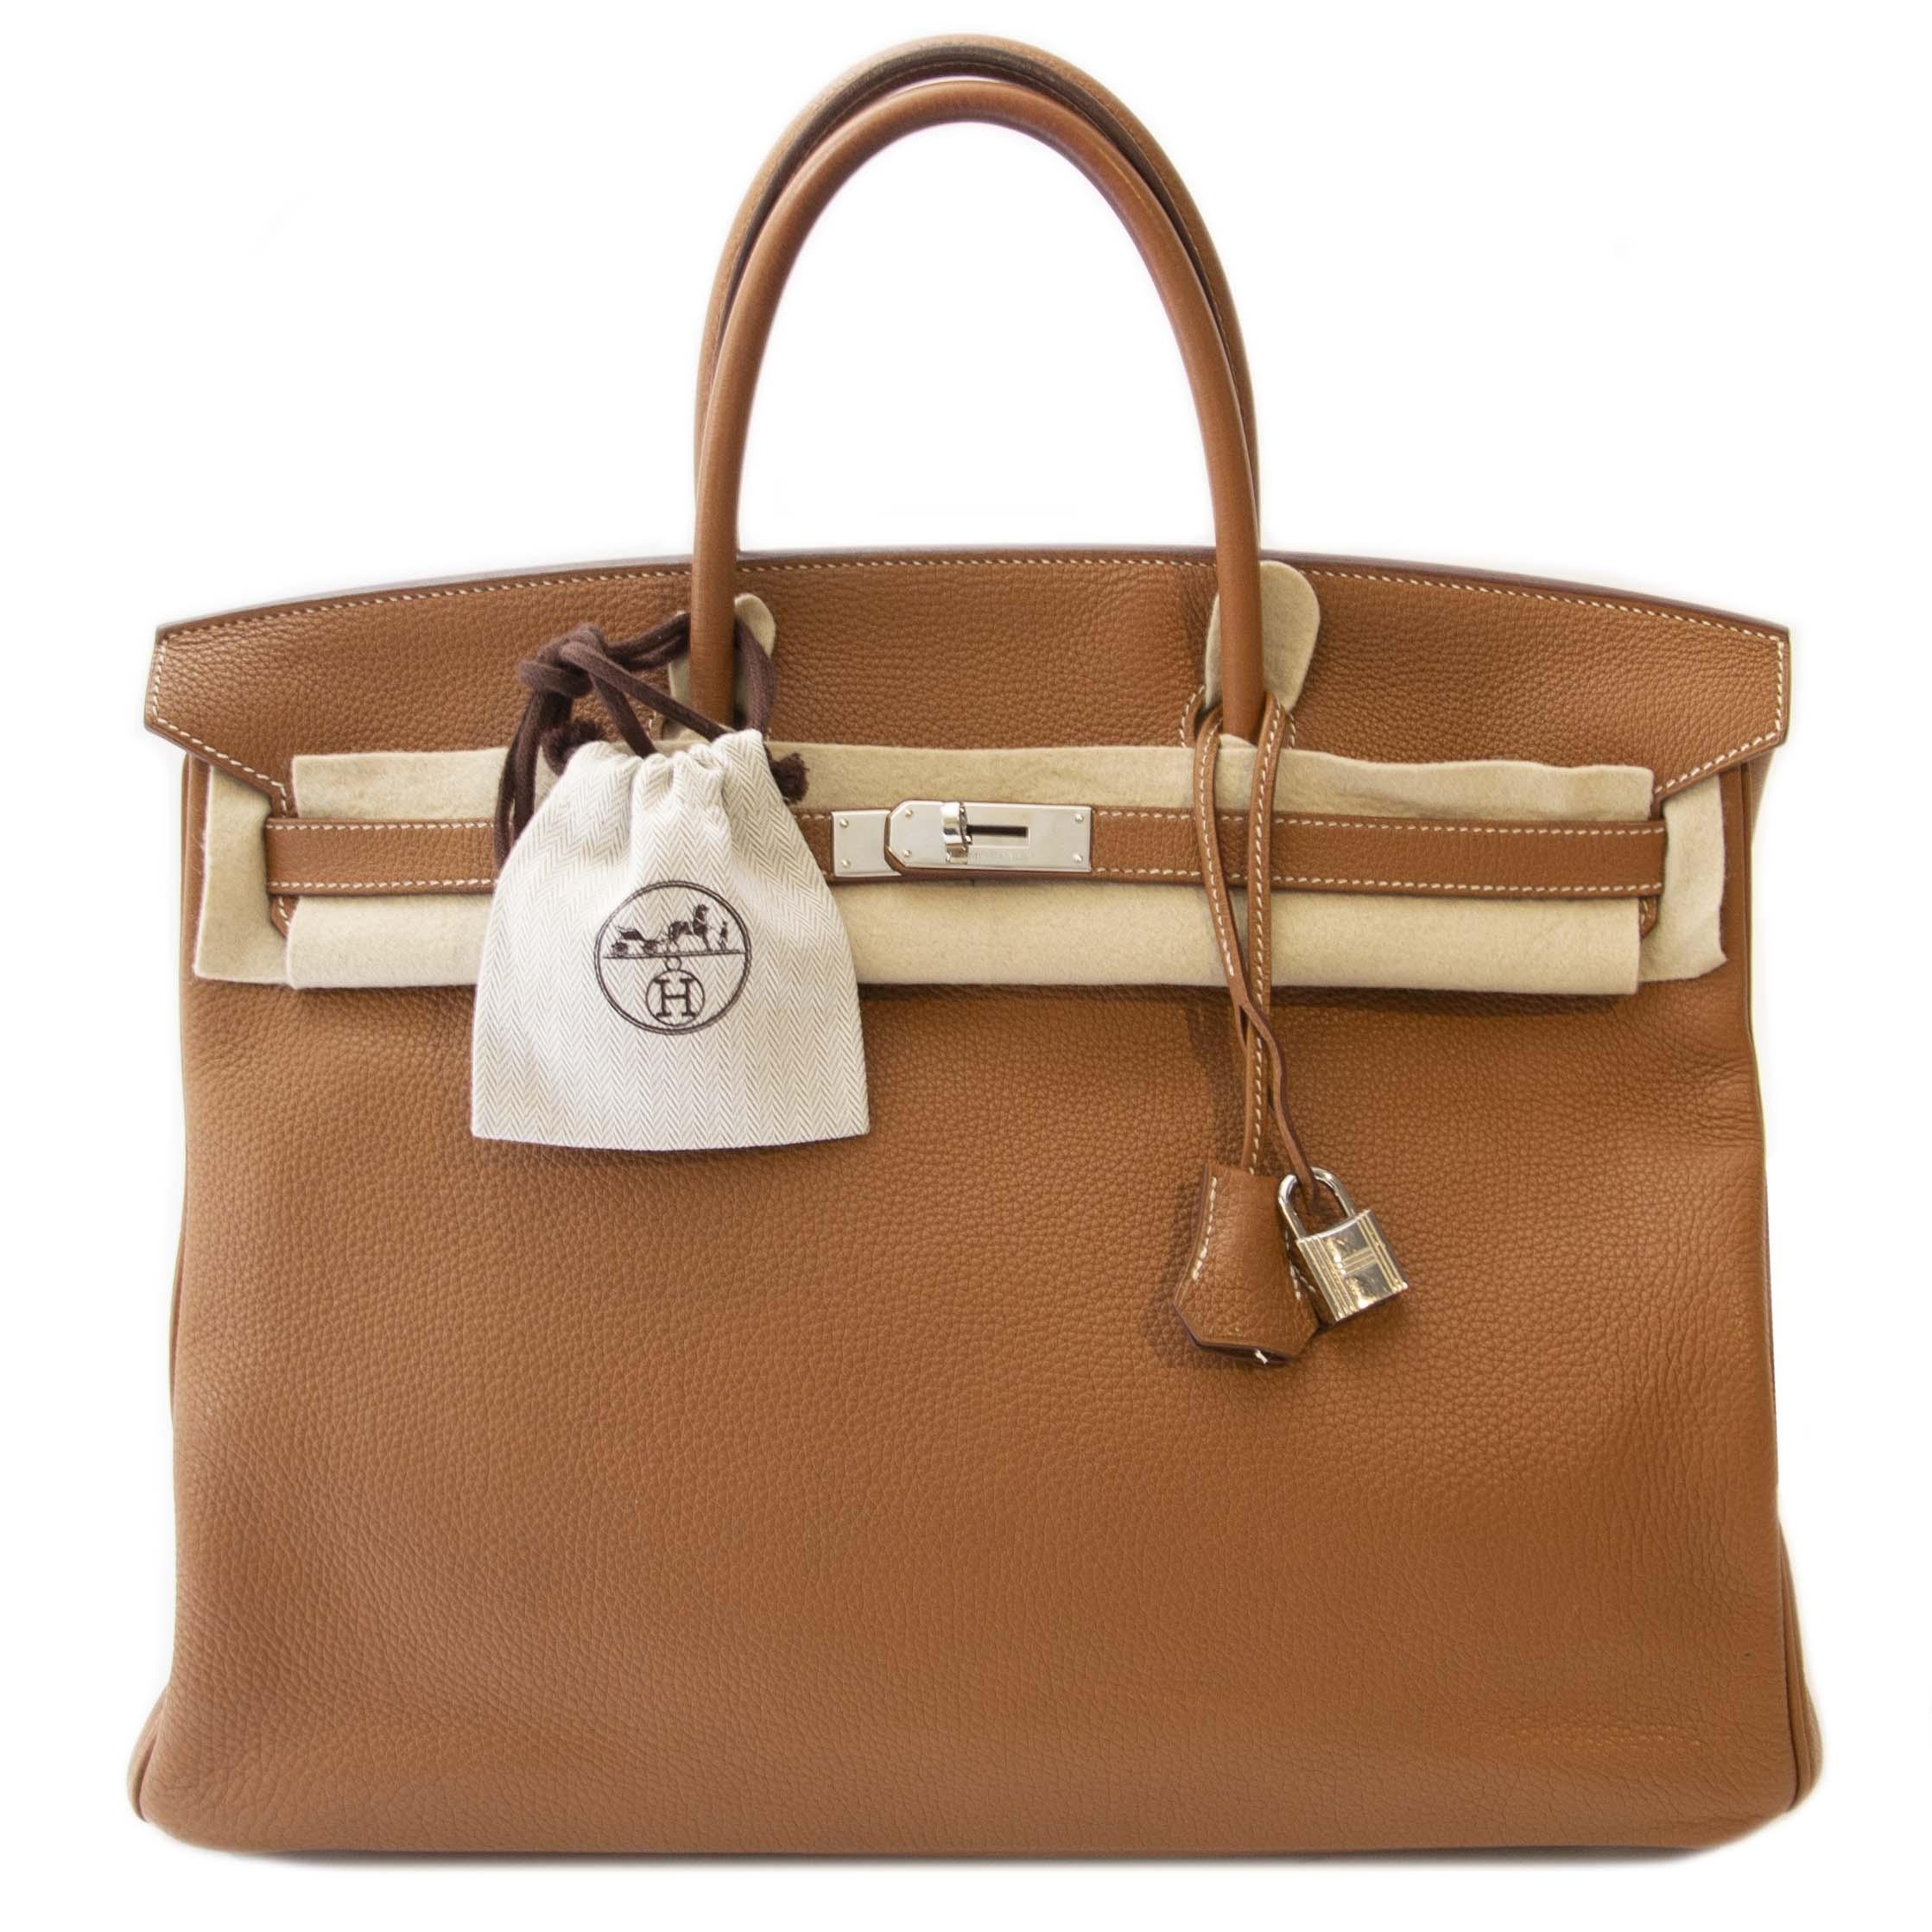 Hermès Birkin 40 Gold Togo PHW